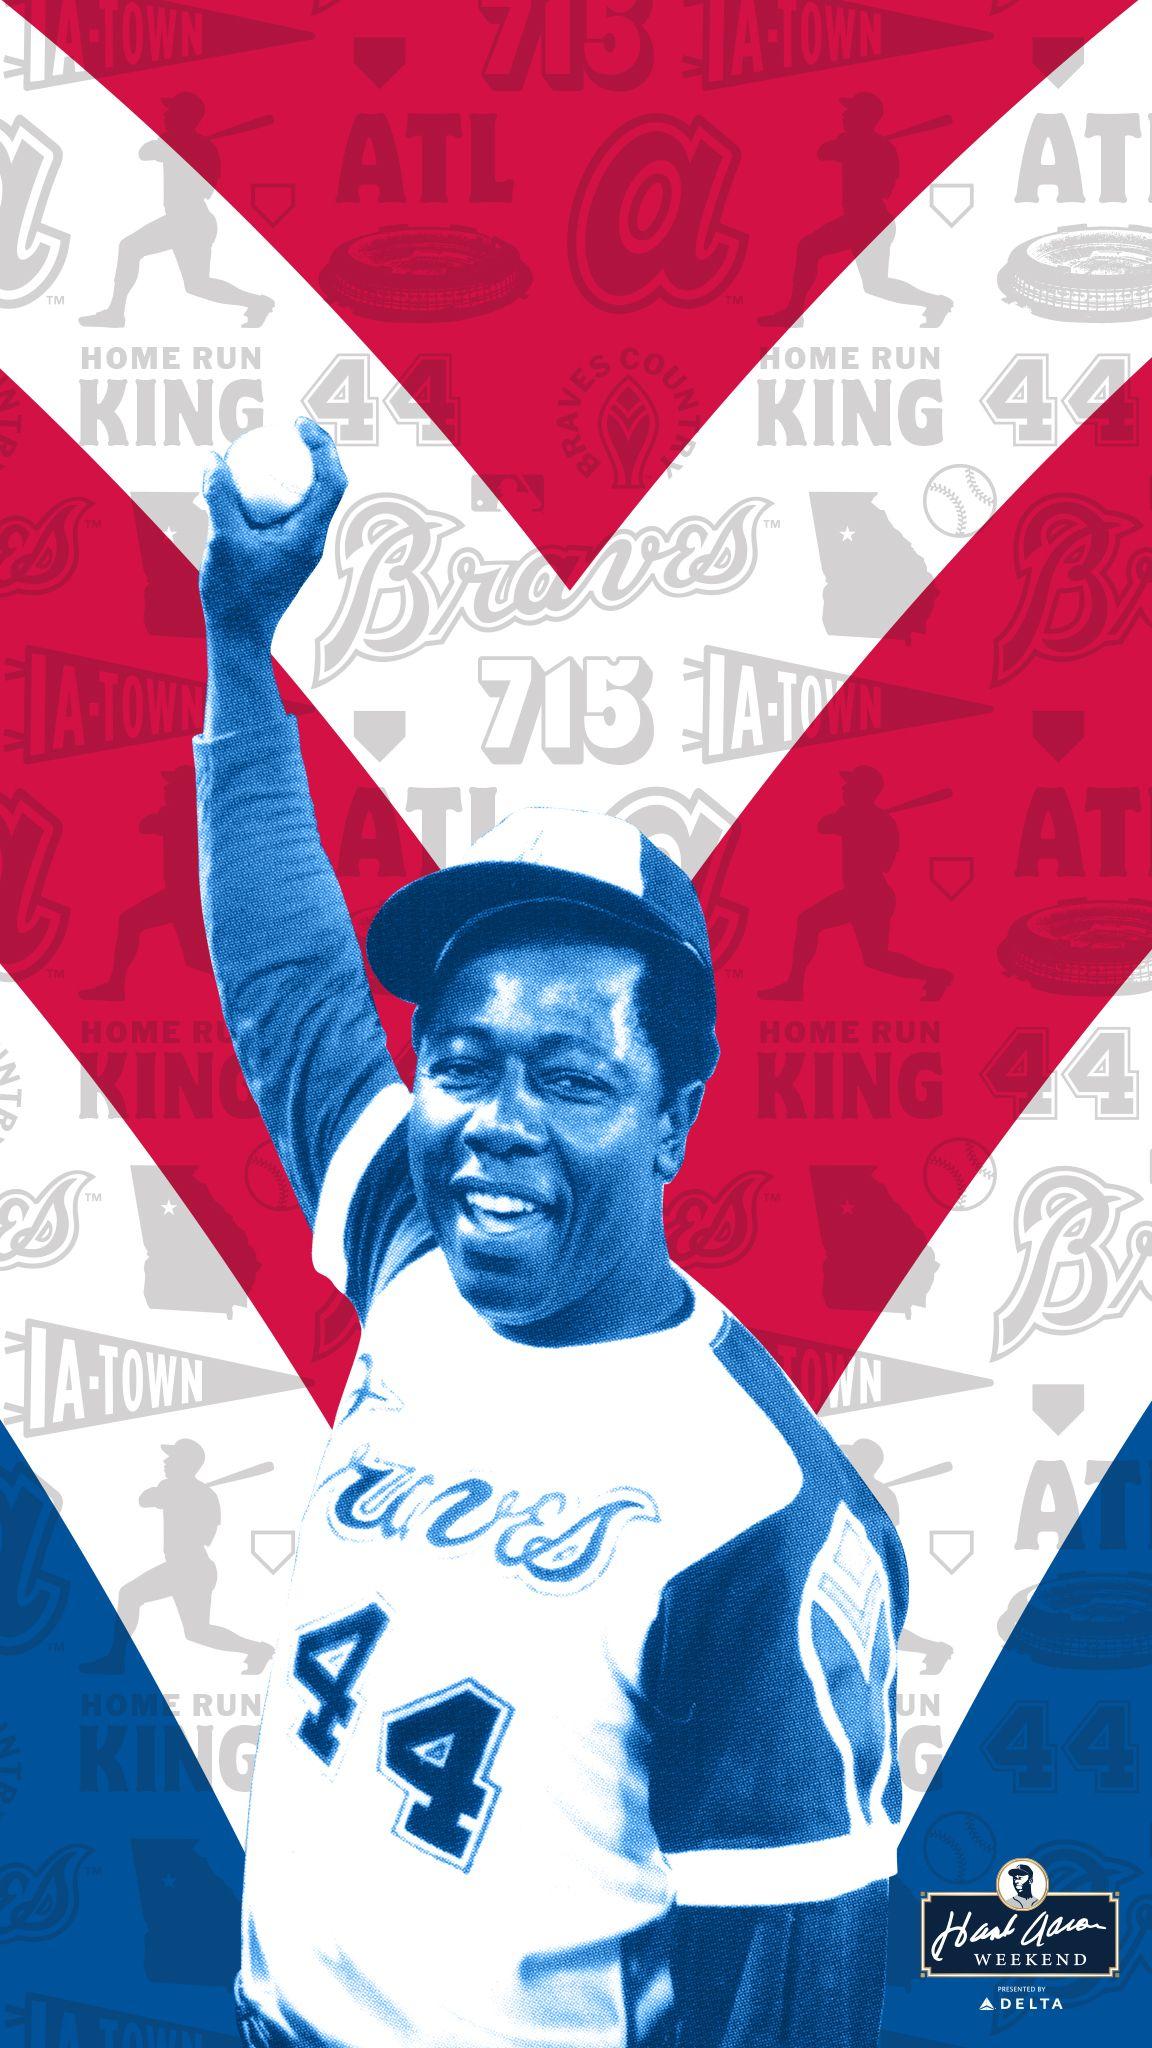 Hank Aaron Wallpaper In 2020 Atlanta Braves Braves Baseball Homerun